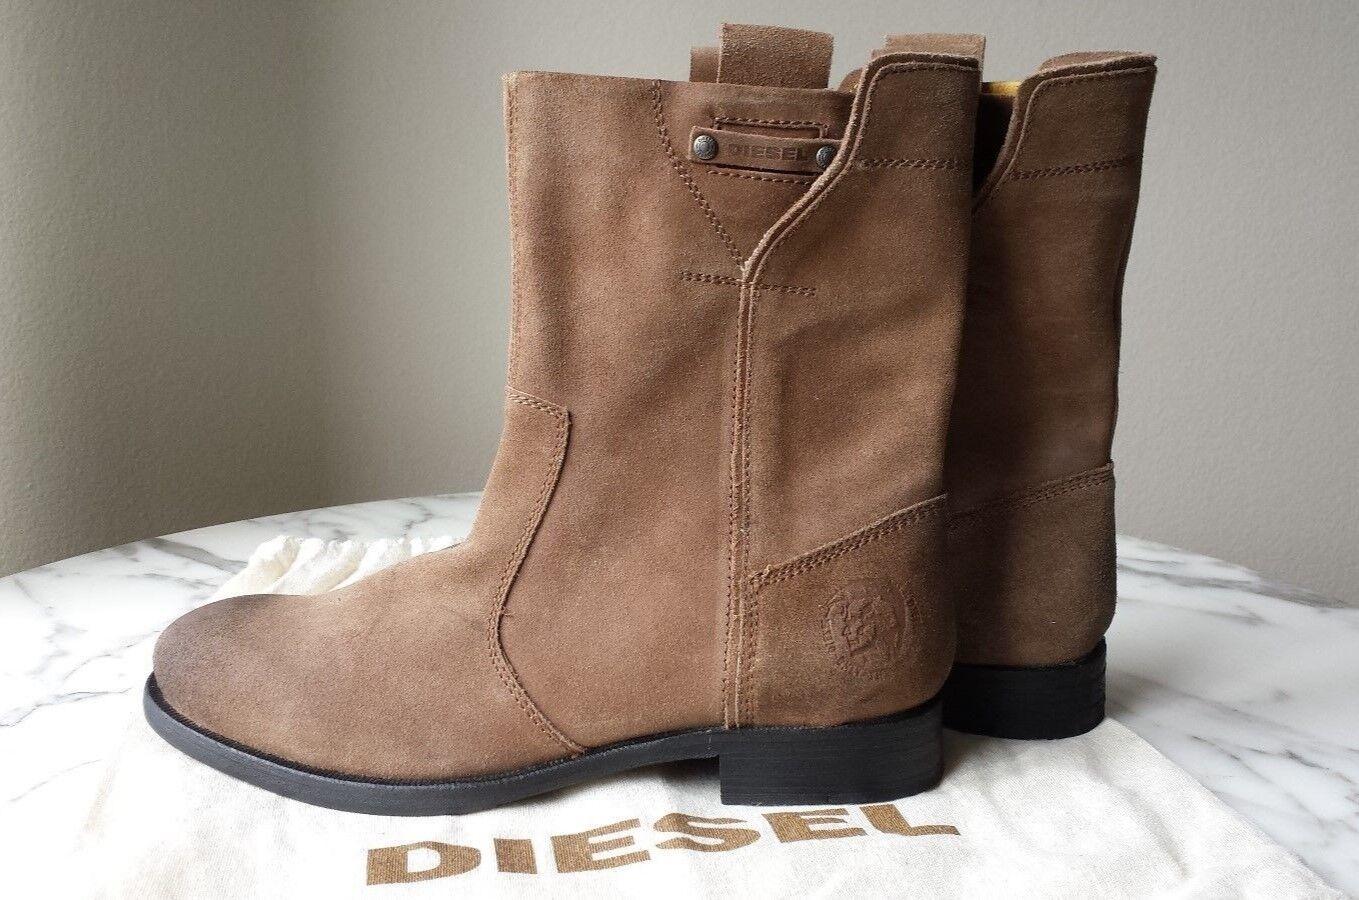 DIESEL Men's Brando bikerboots Camel color suede leather Size US 10  NEW